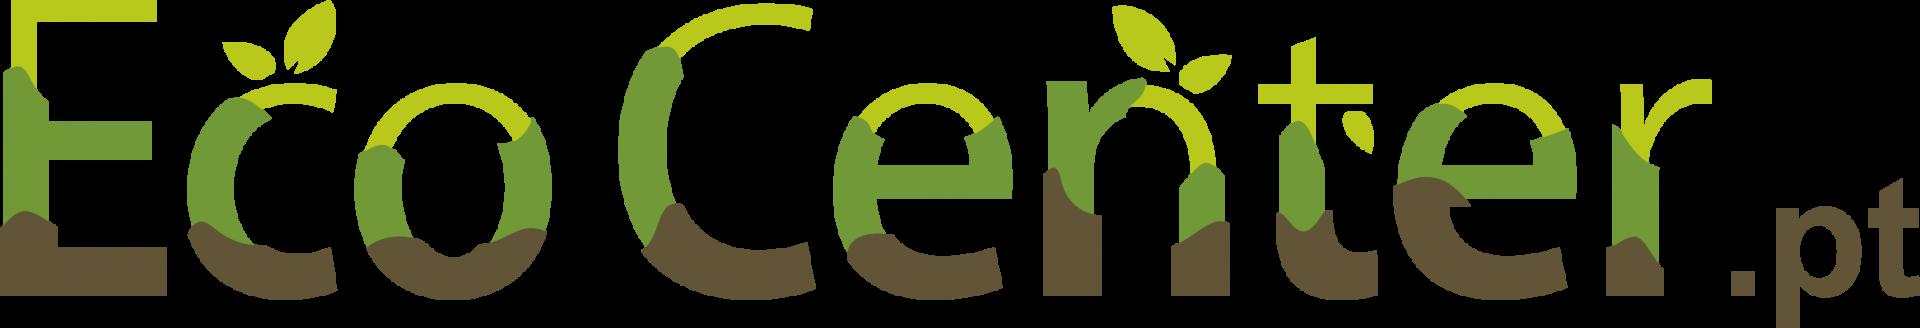 Ecocenter